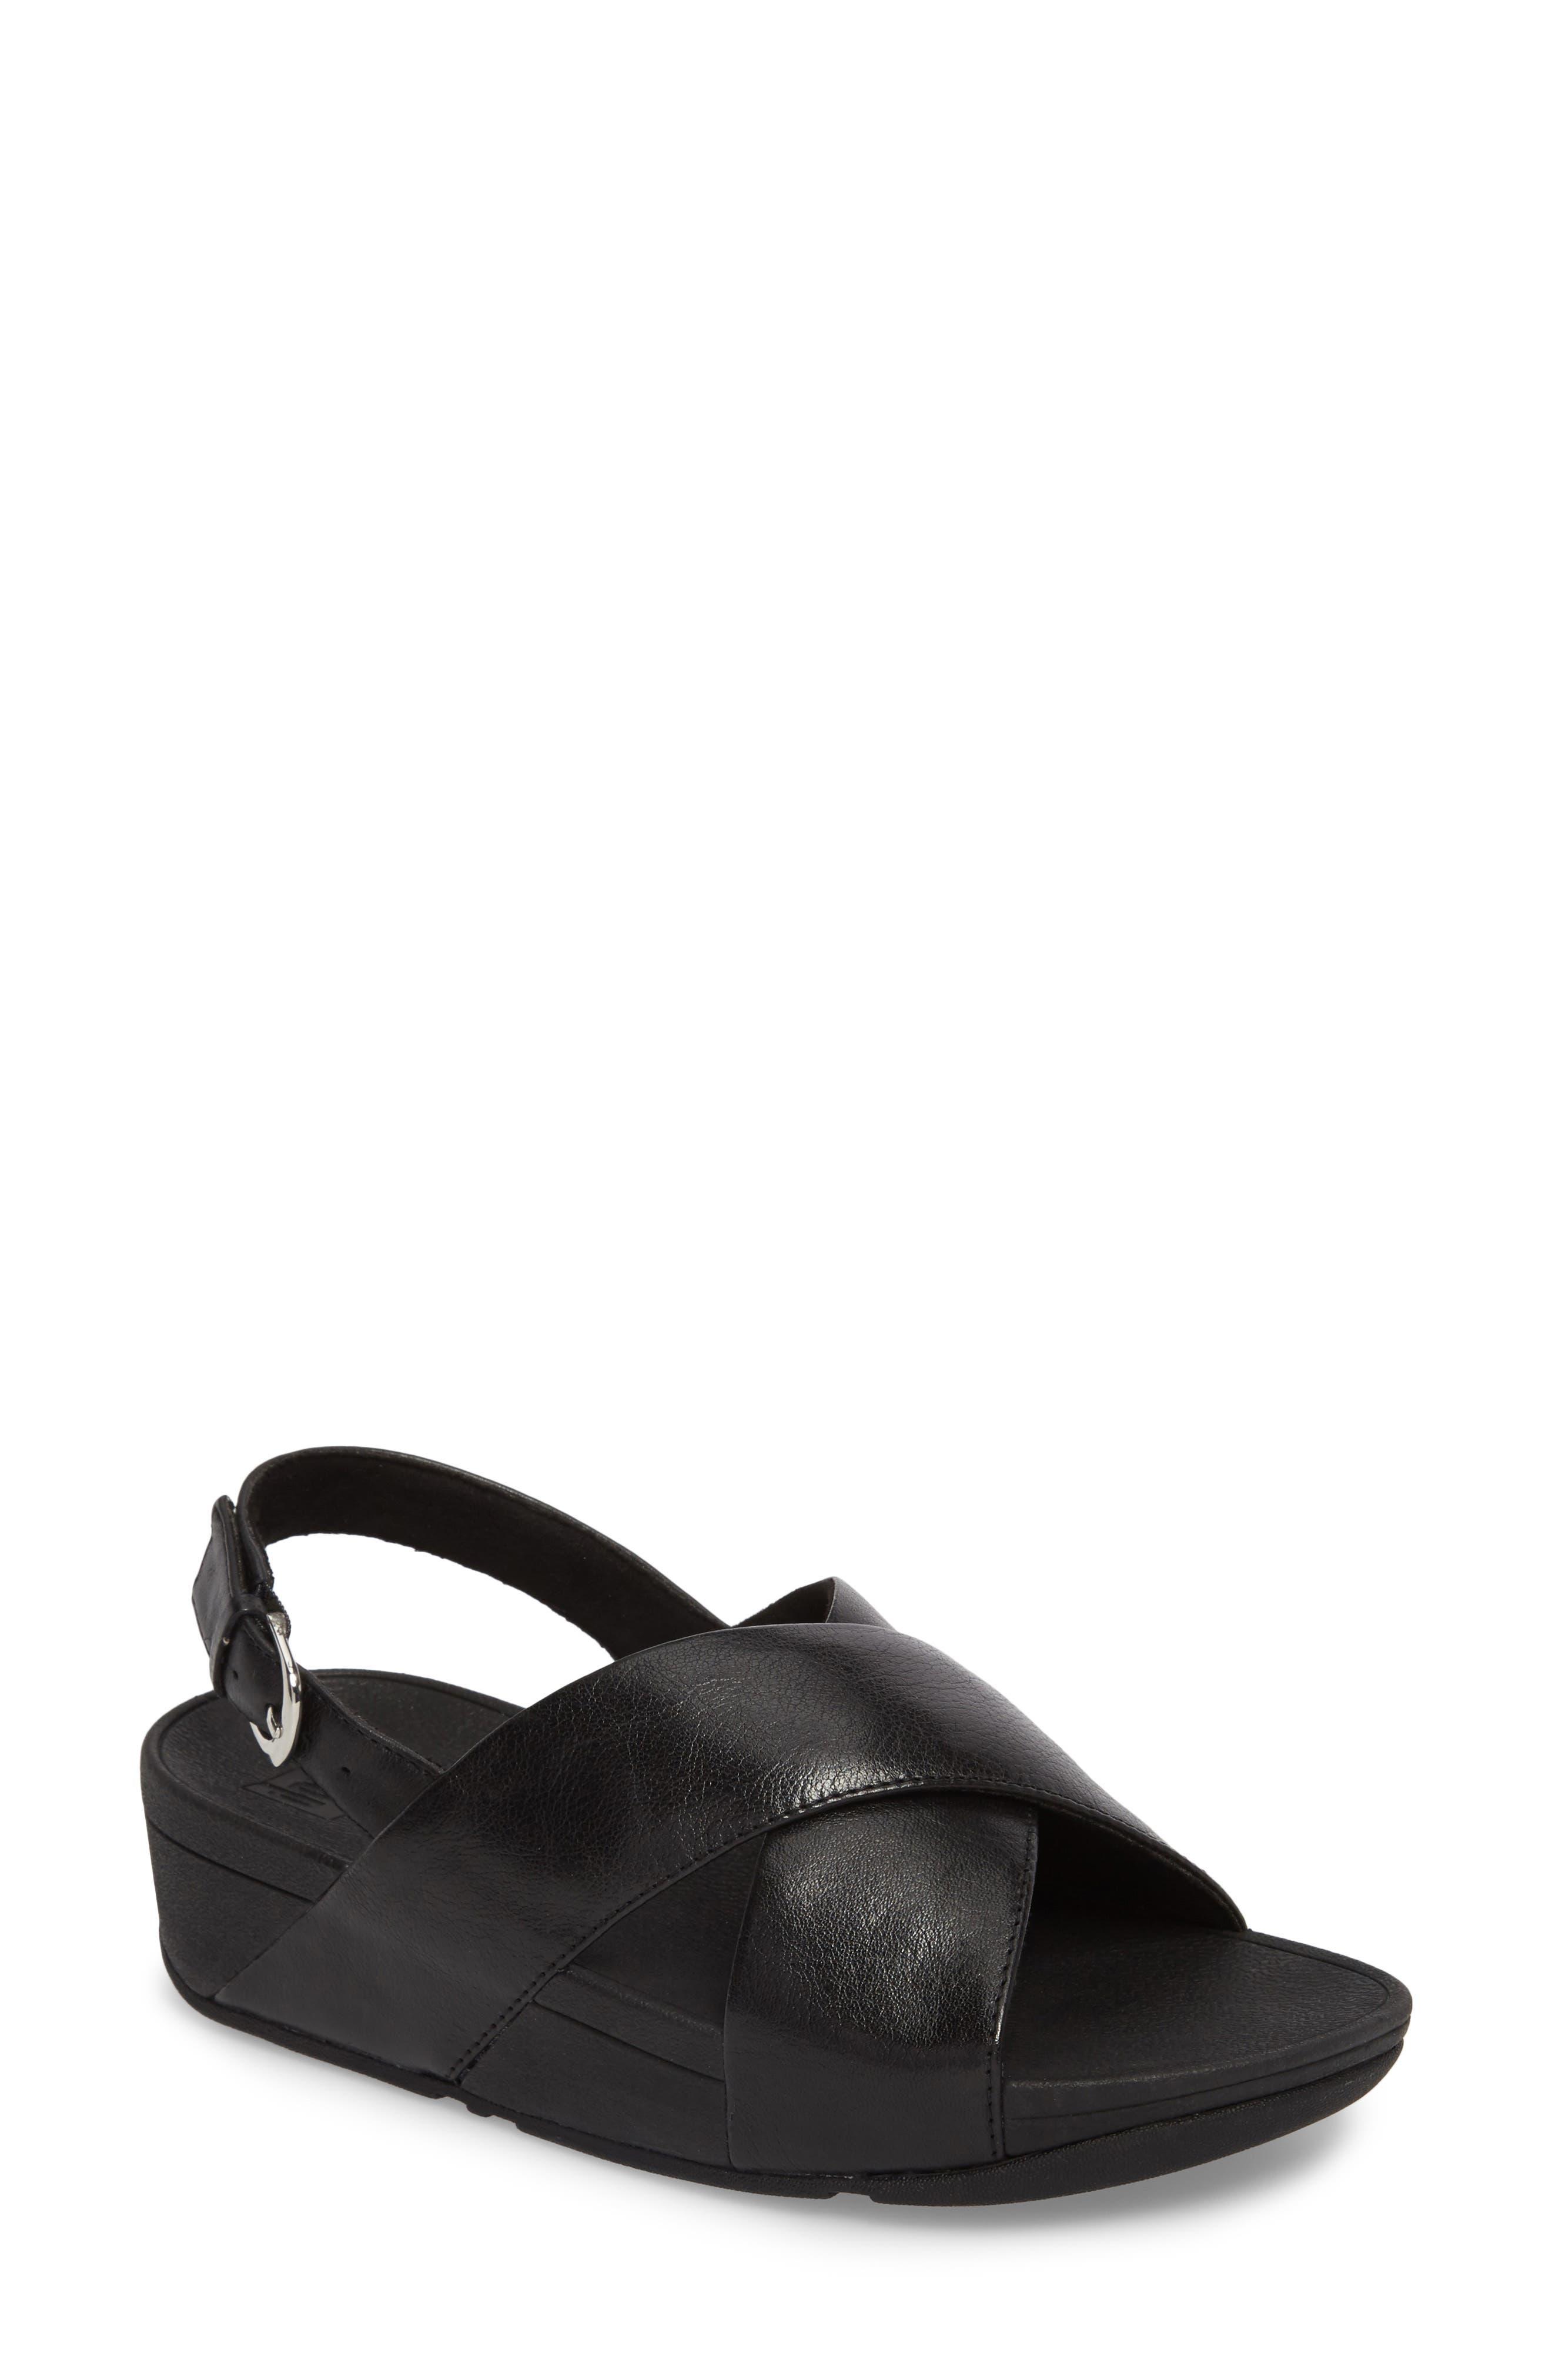 Lulu Crisscross Sandal,                             Main thumbnail 1, color,                             BLACK